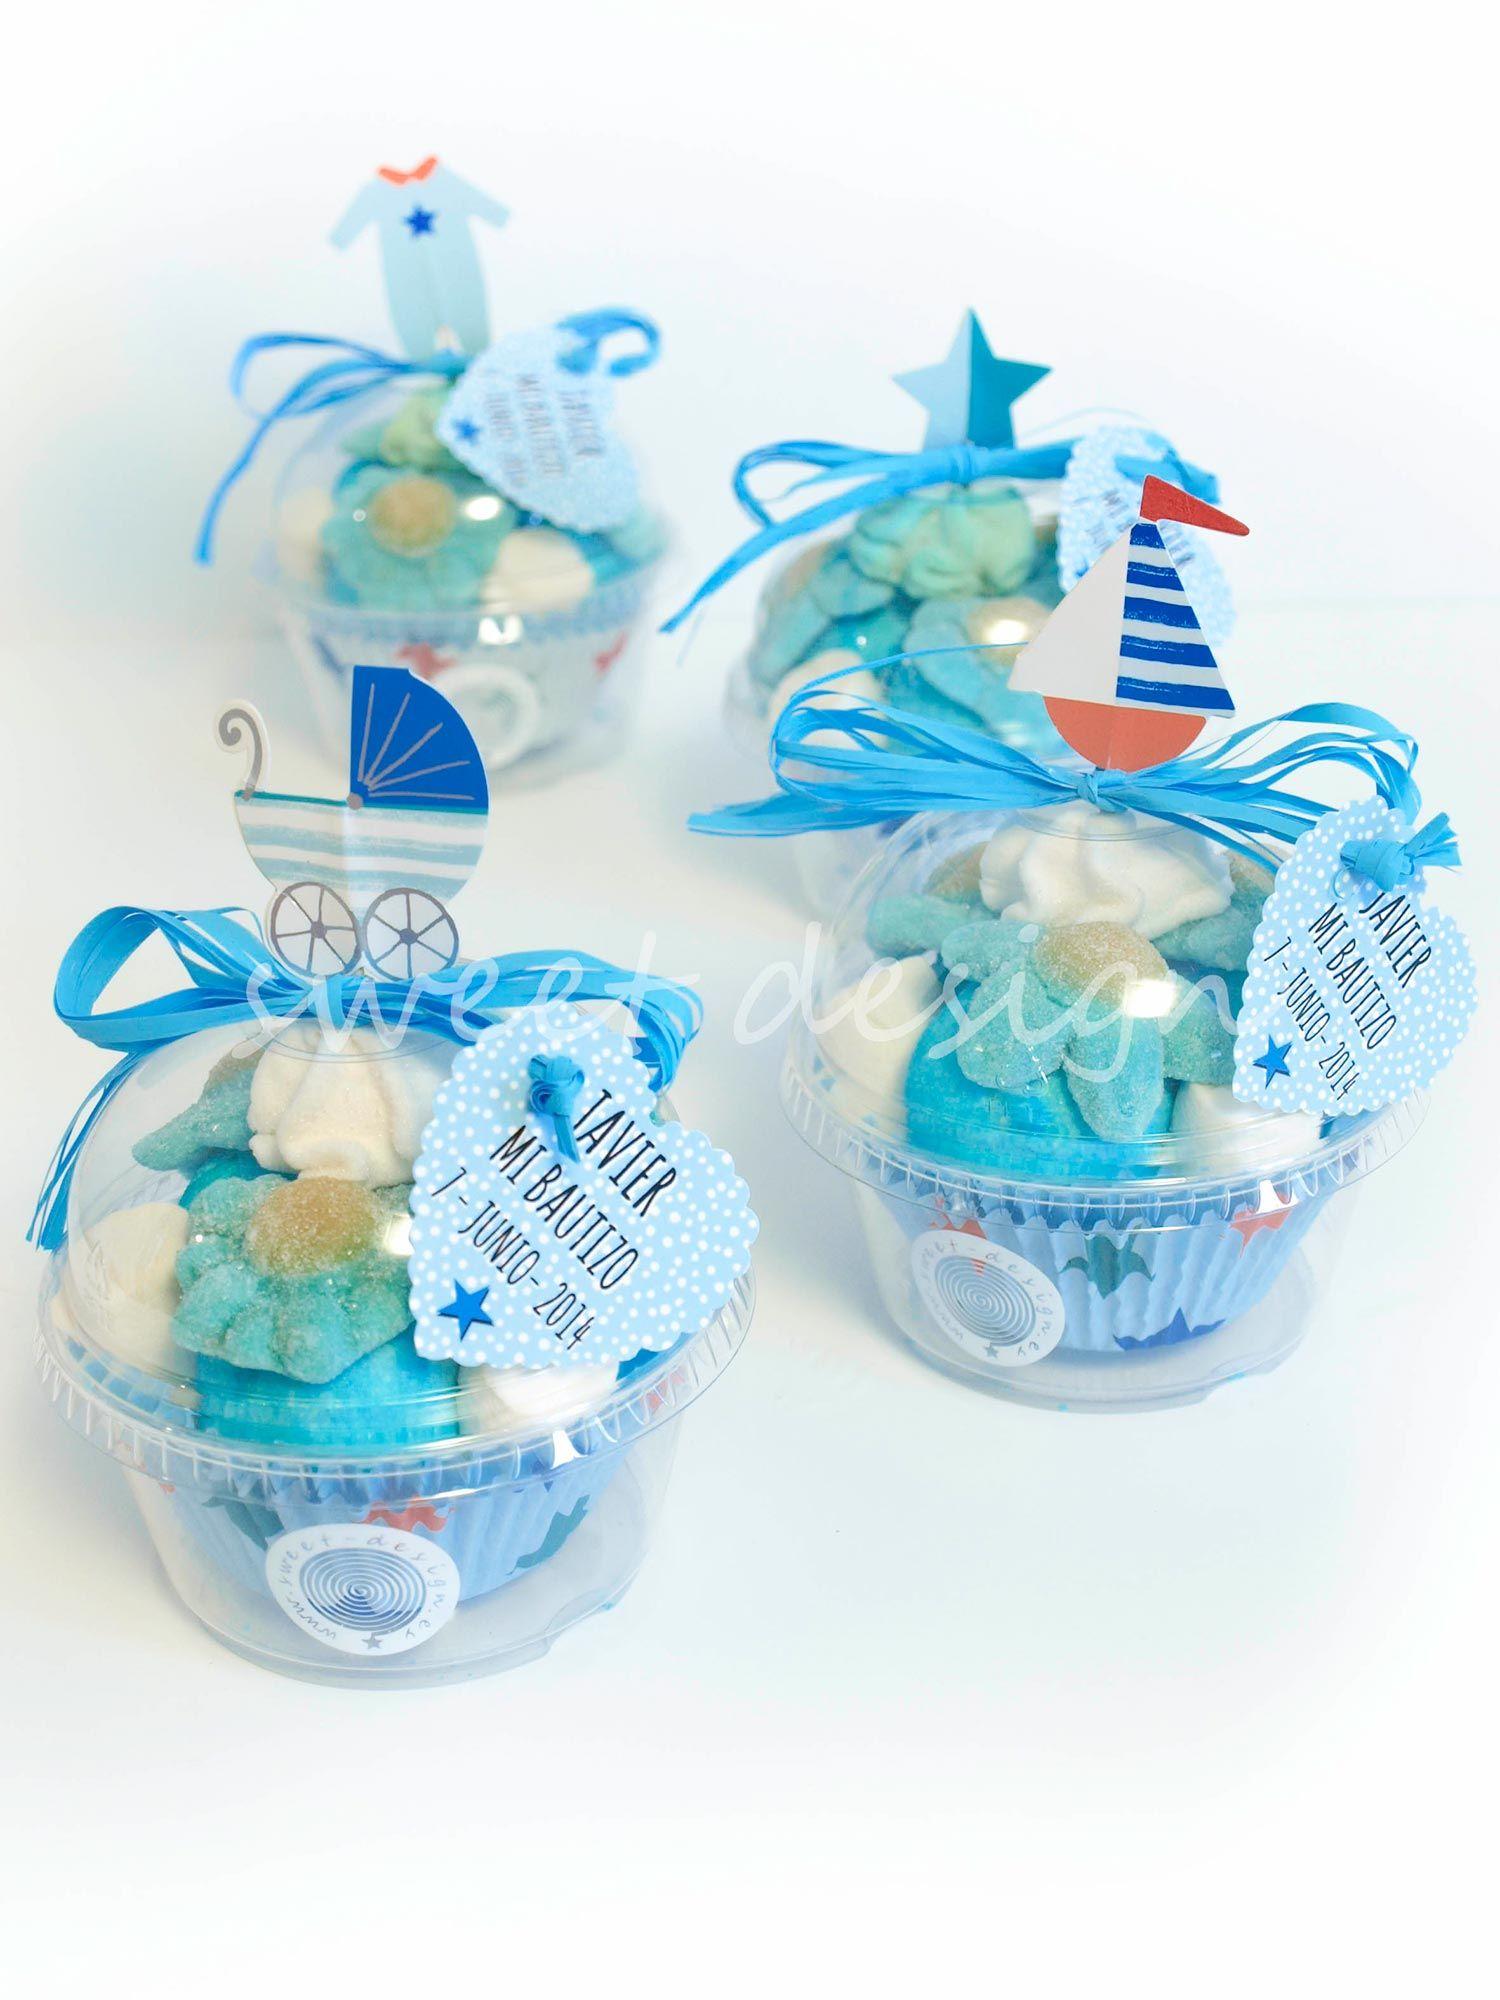 Recuerdos Para Bautizo Nino Con Dulces.Vasito Cupcake De Bebe Azul Otono Baby Shower Recuerdos